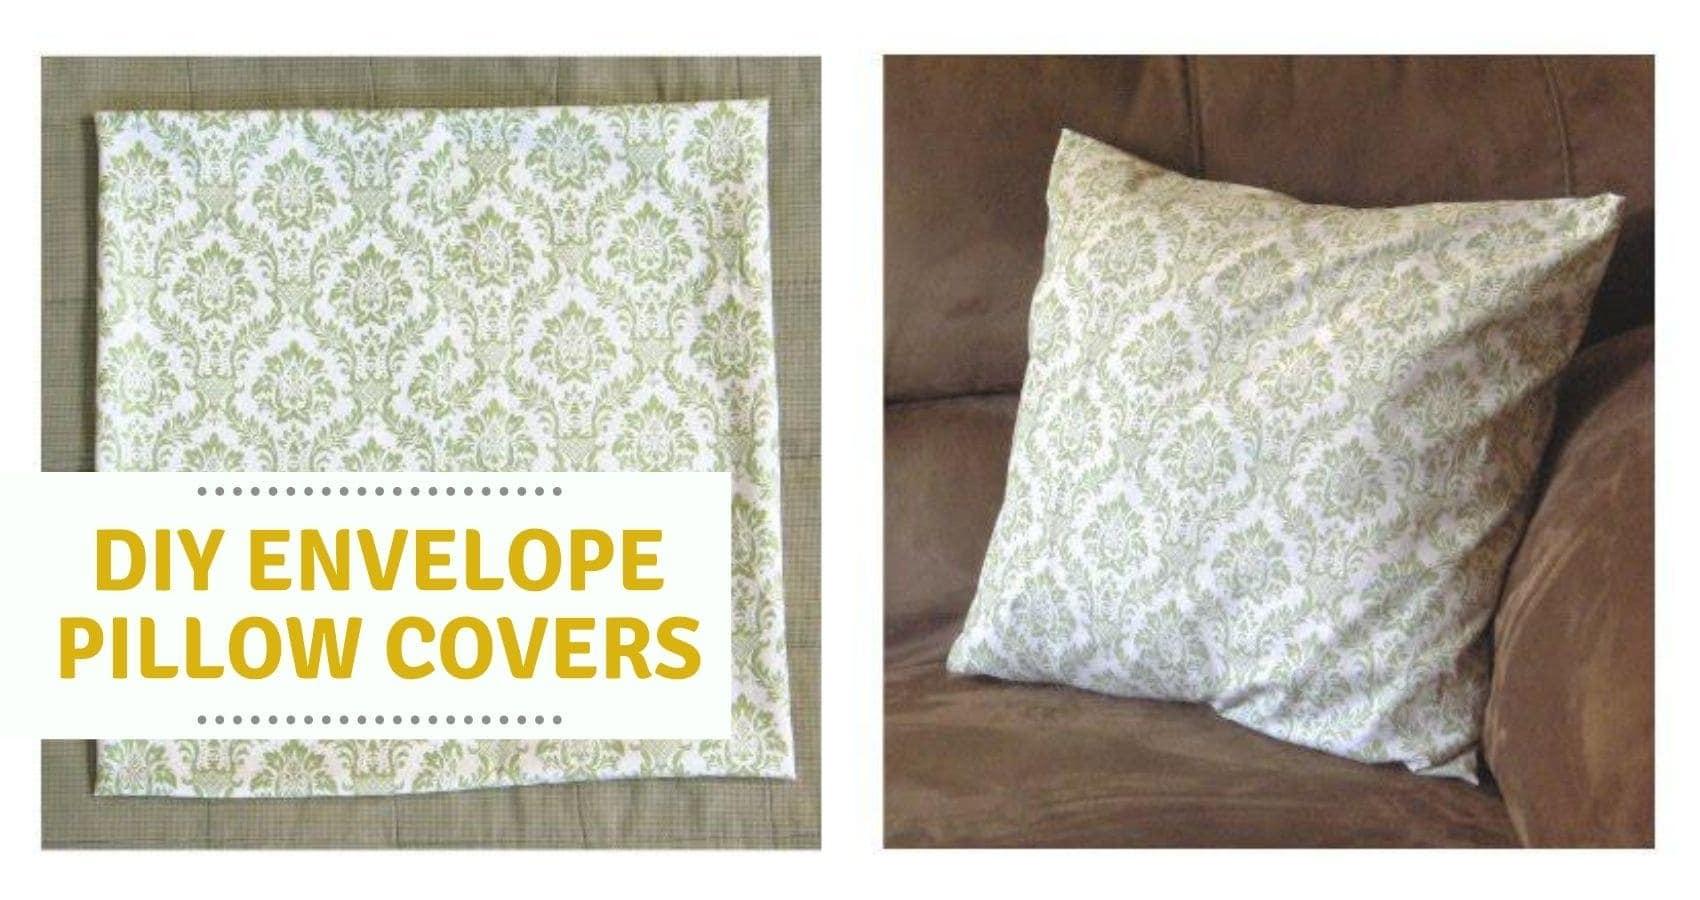 17x17 envelope pillow cover tutorial